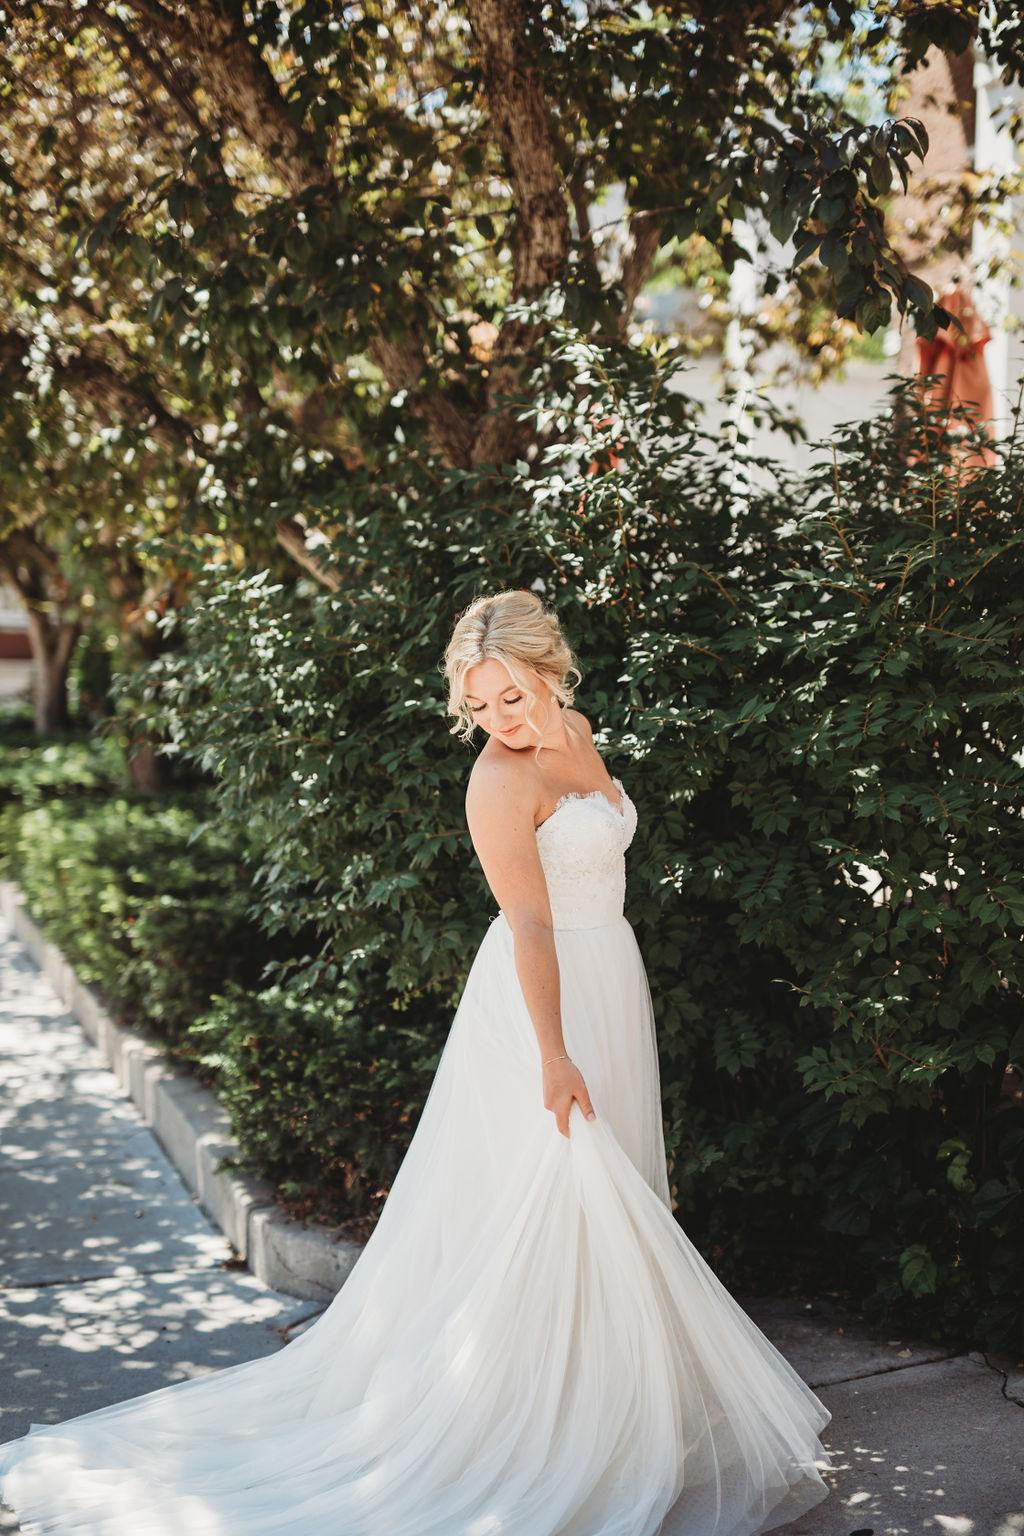 engle-olson-katie-dalton-wedding-clewell-photography-20.jpg